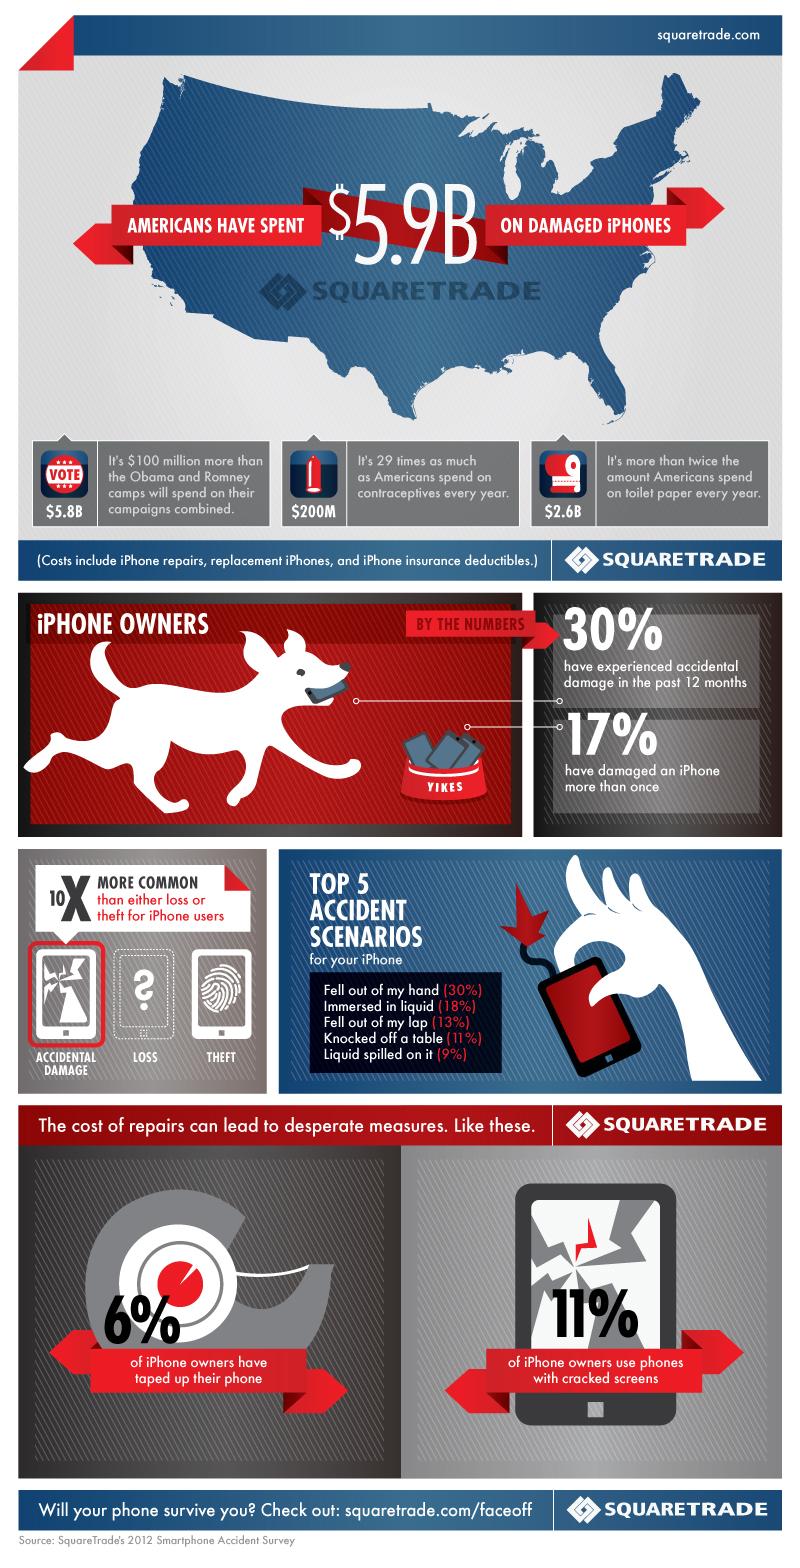 squaretrade_survery_infographic